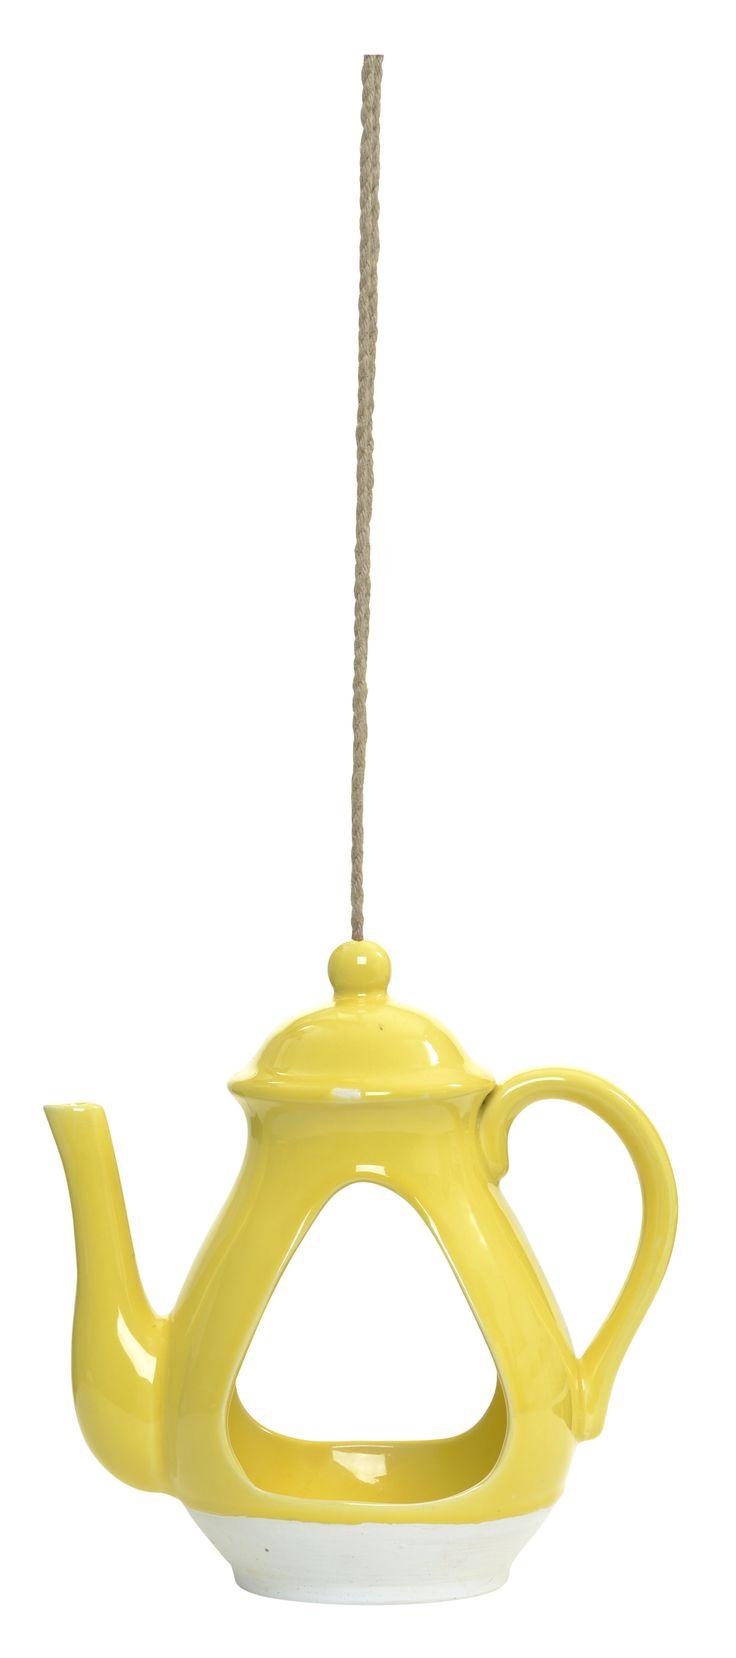 Hanging bird feeder in yellow